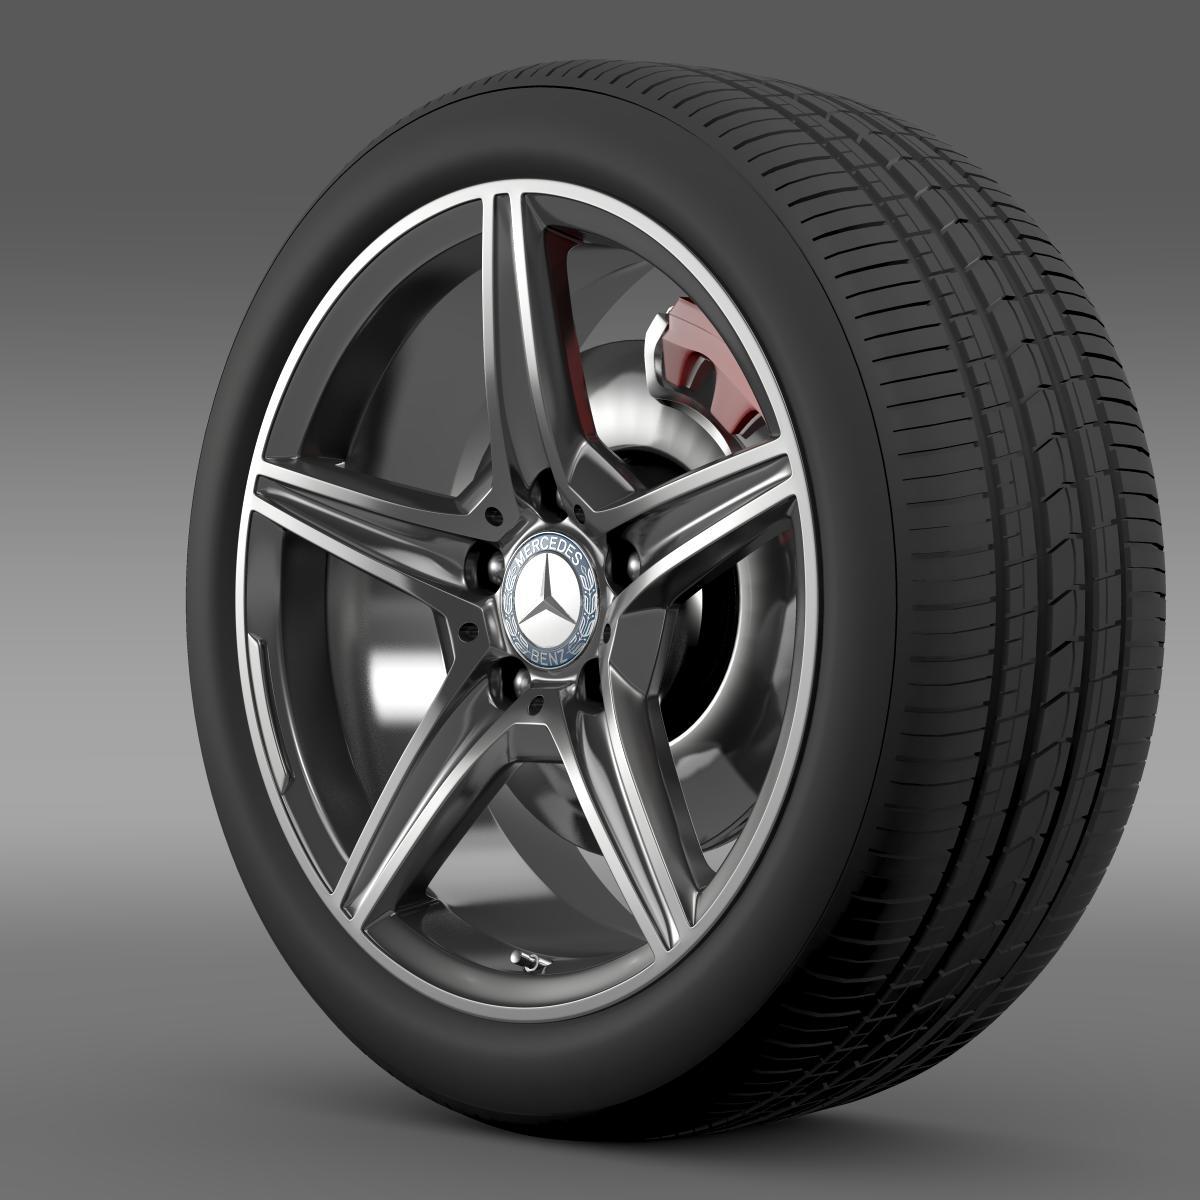 mercedes benz c 400 4matic amg line wheel 3d model 3ds max fbx c4d lwo ma mb hrc xsi obj 210784